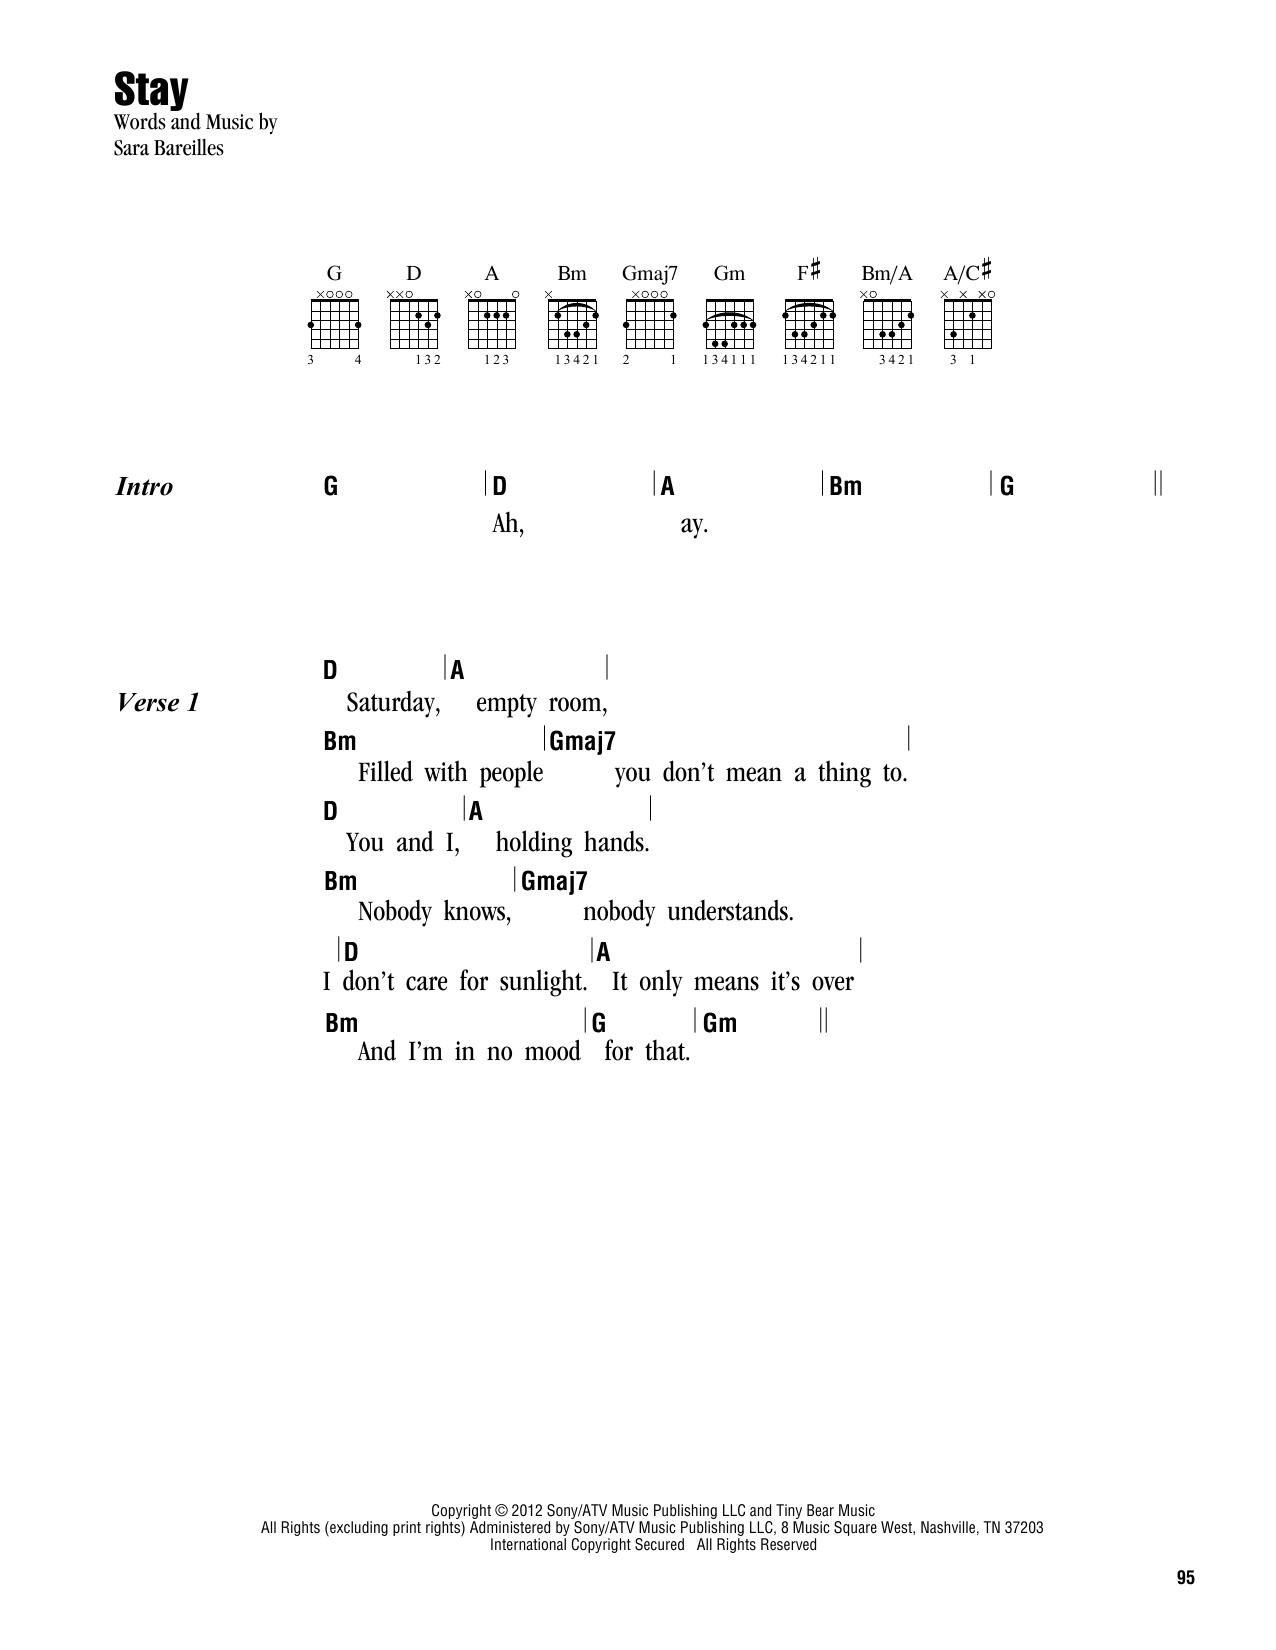 Stay (Guitar Chords/Lyrics)